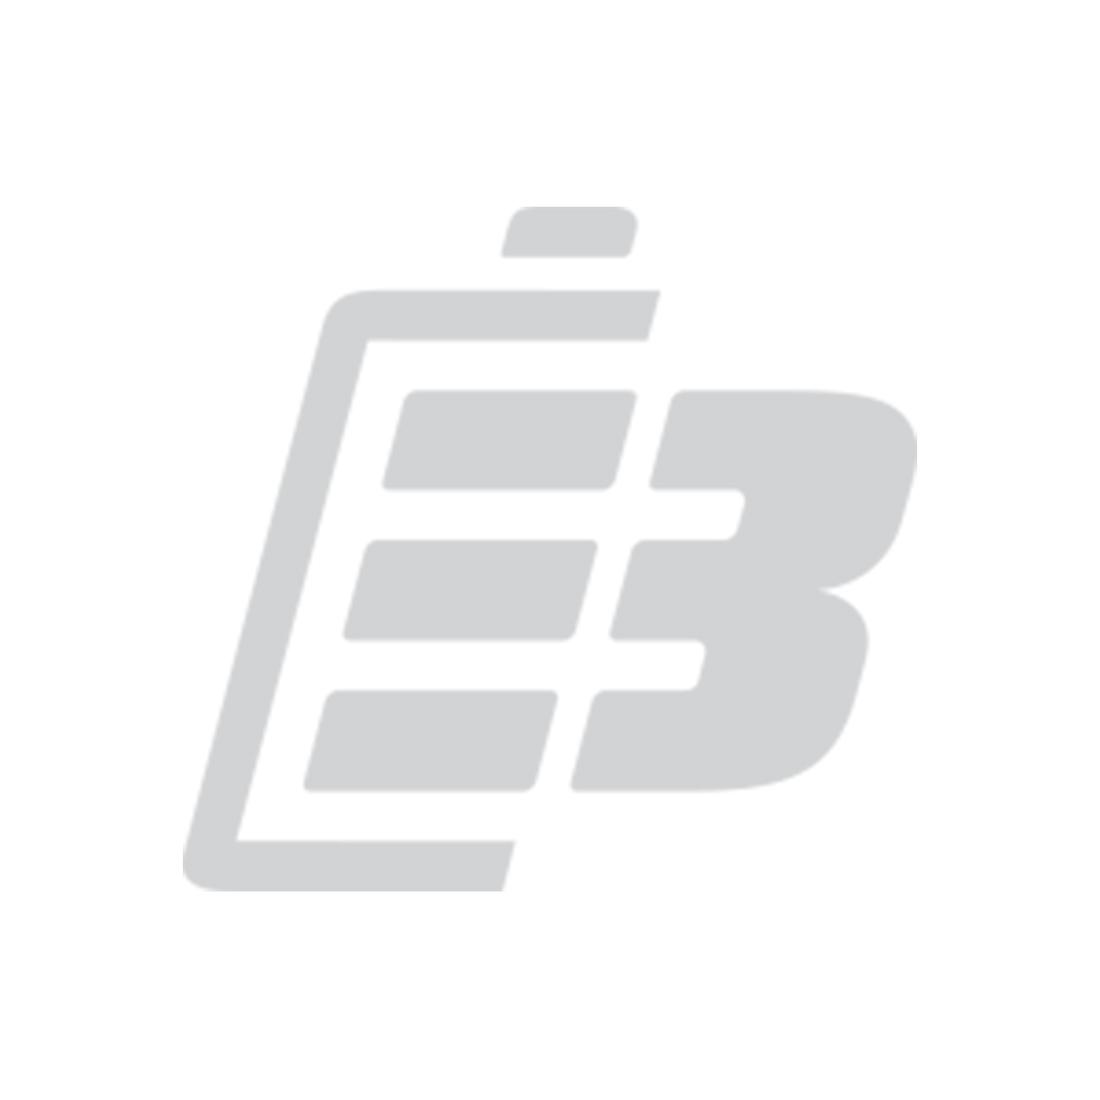 Two-Way radio battery Kenwood PB-43H_1